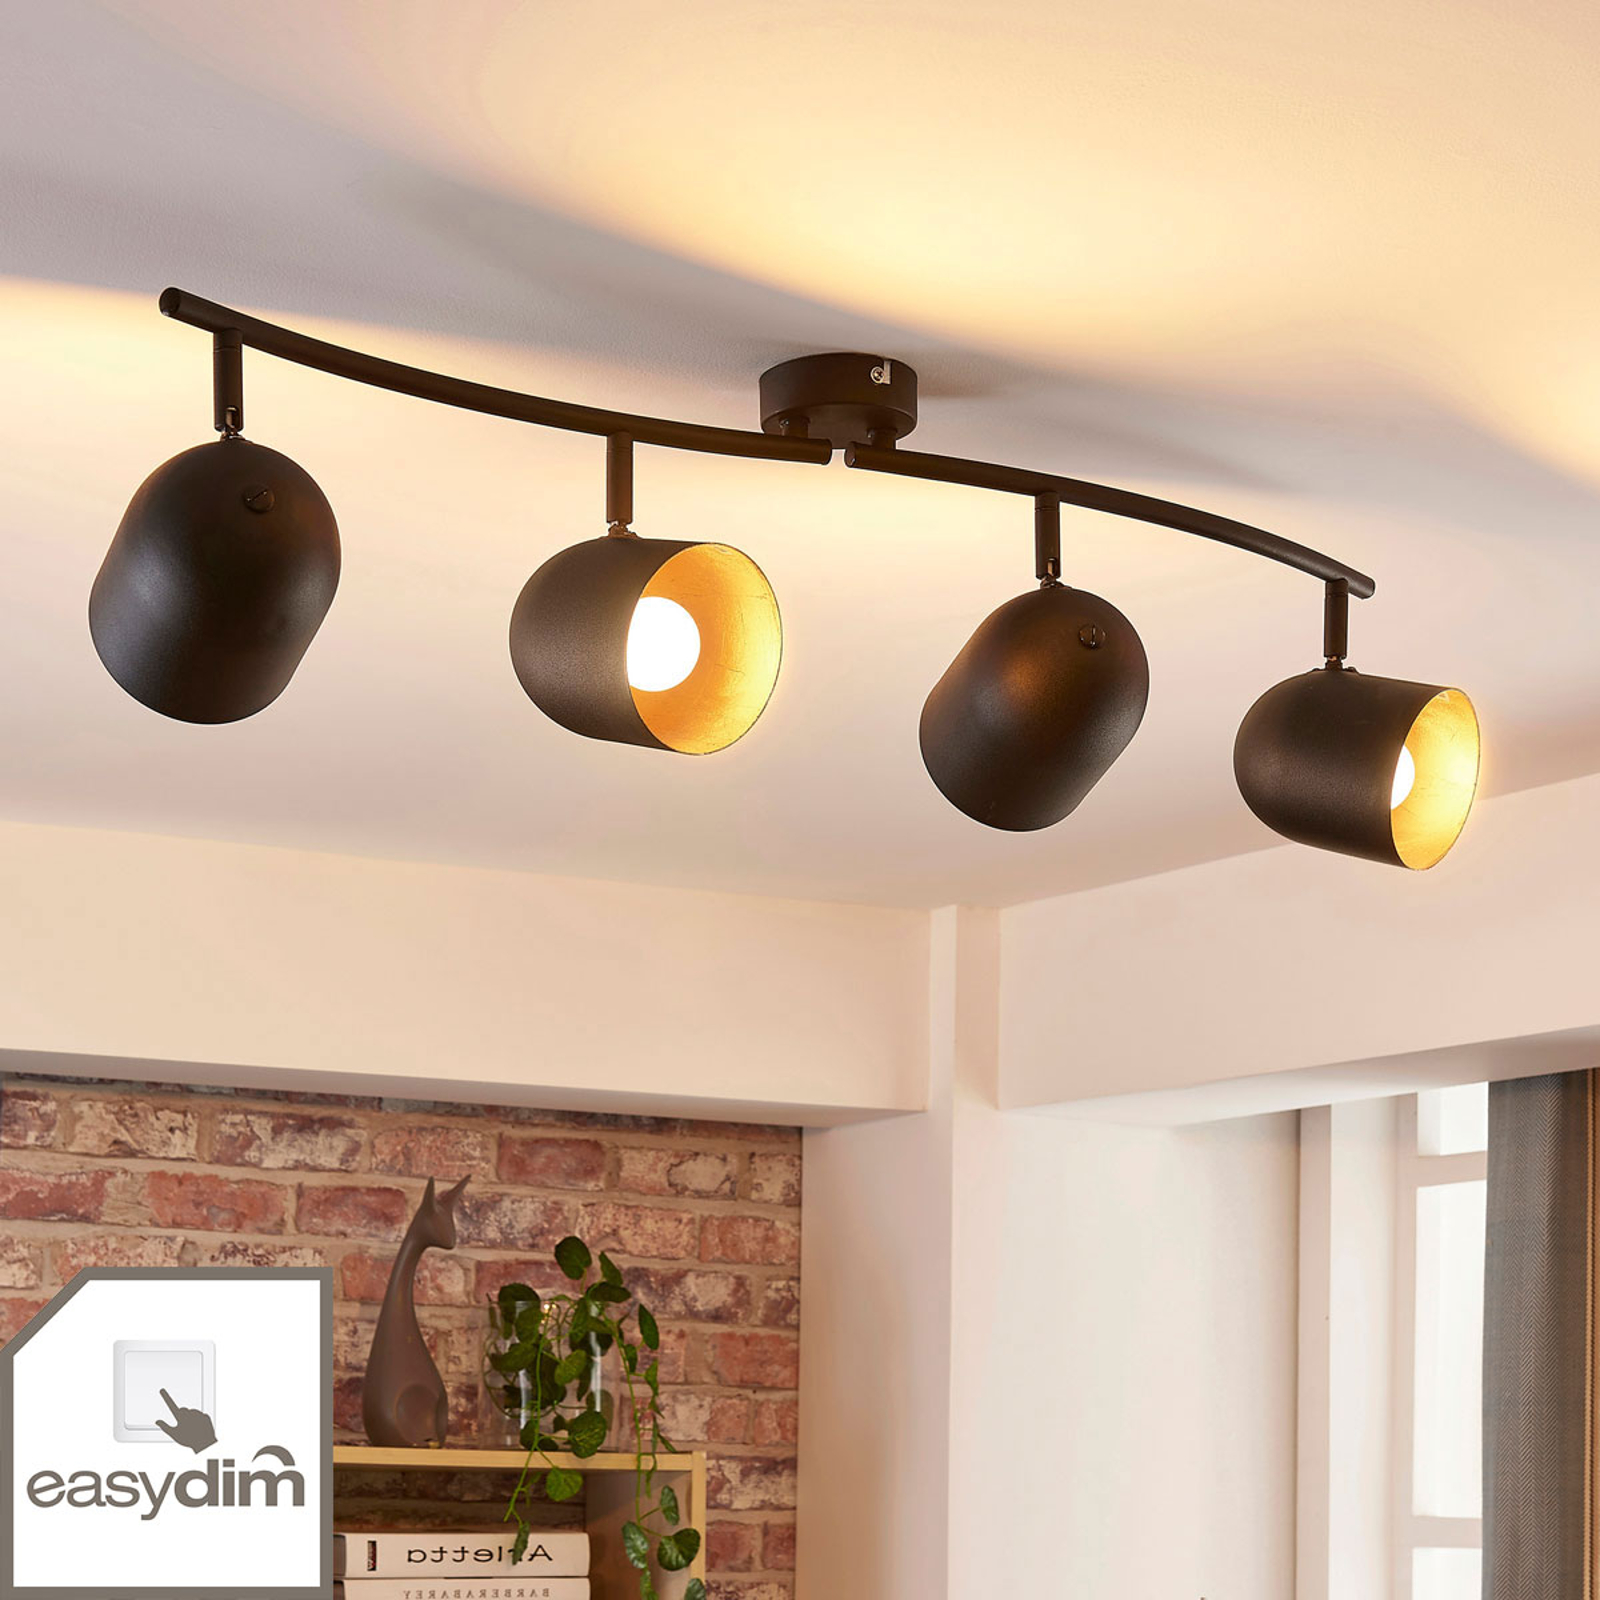 4-lamppuinen LED-kattokohdevalo Morik, himmennys